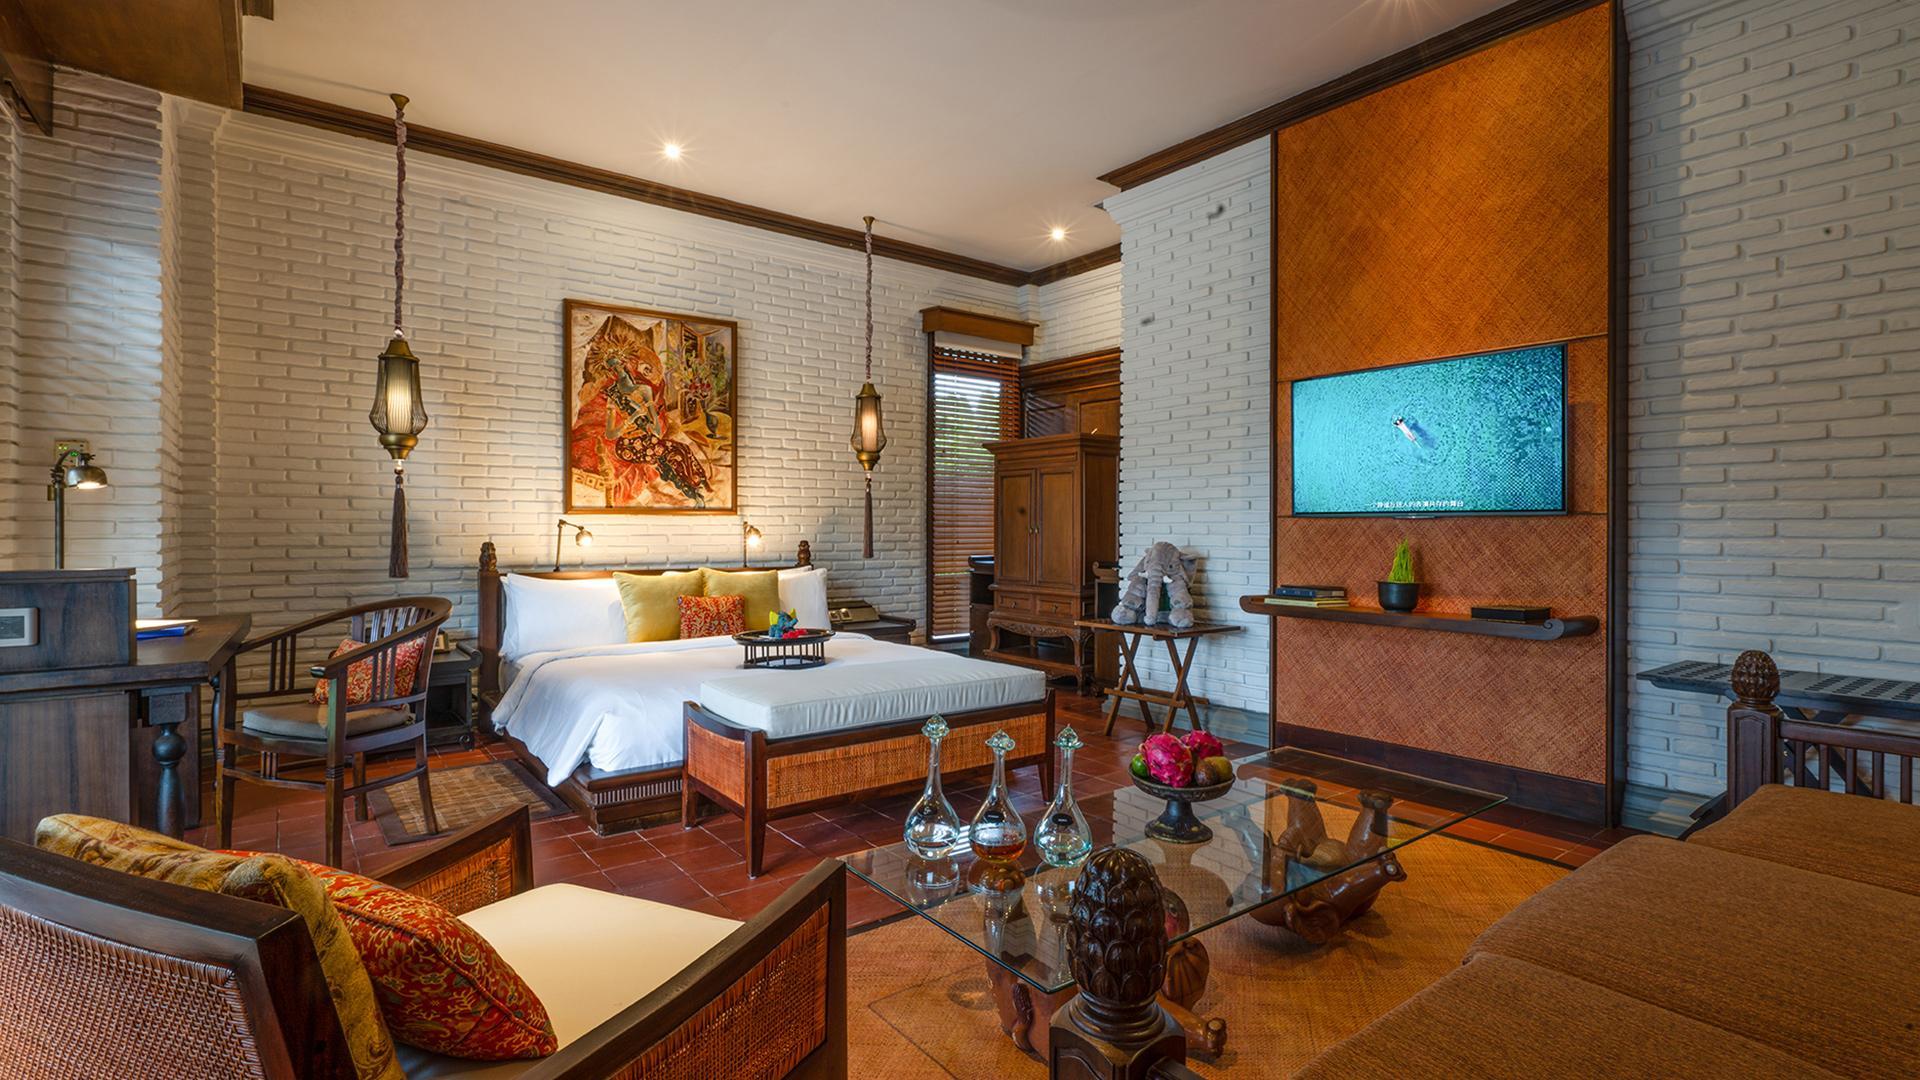 One Bedroom Club Suite image 1 at Tanah Gajah, a Resort by Hadiprana by Kabupaten Gianyar, Bali, Indonesia